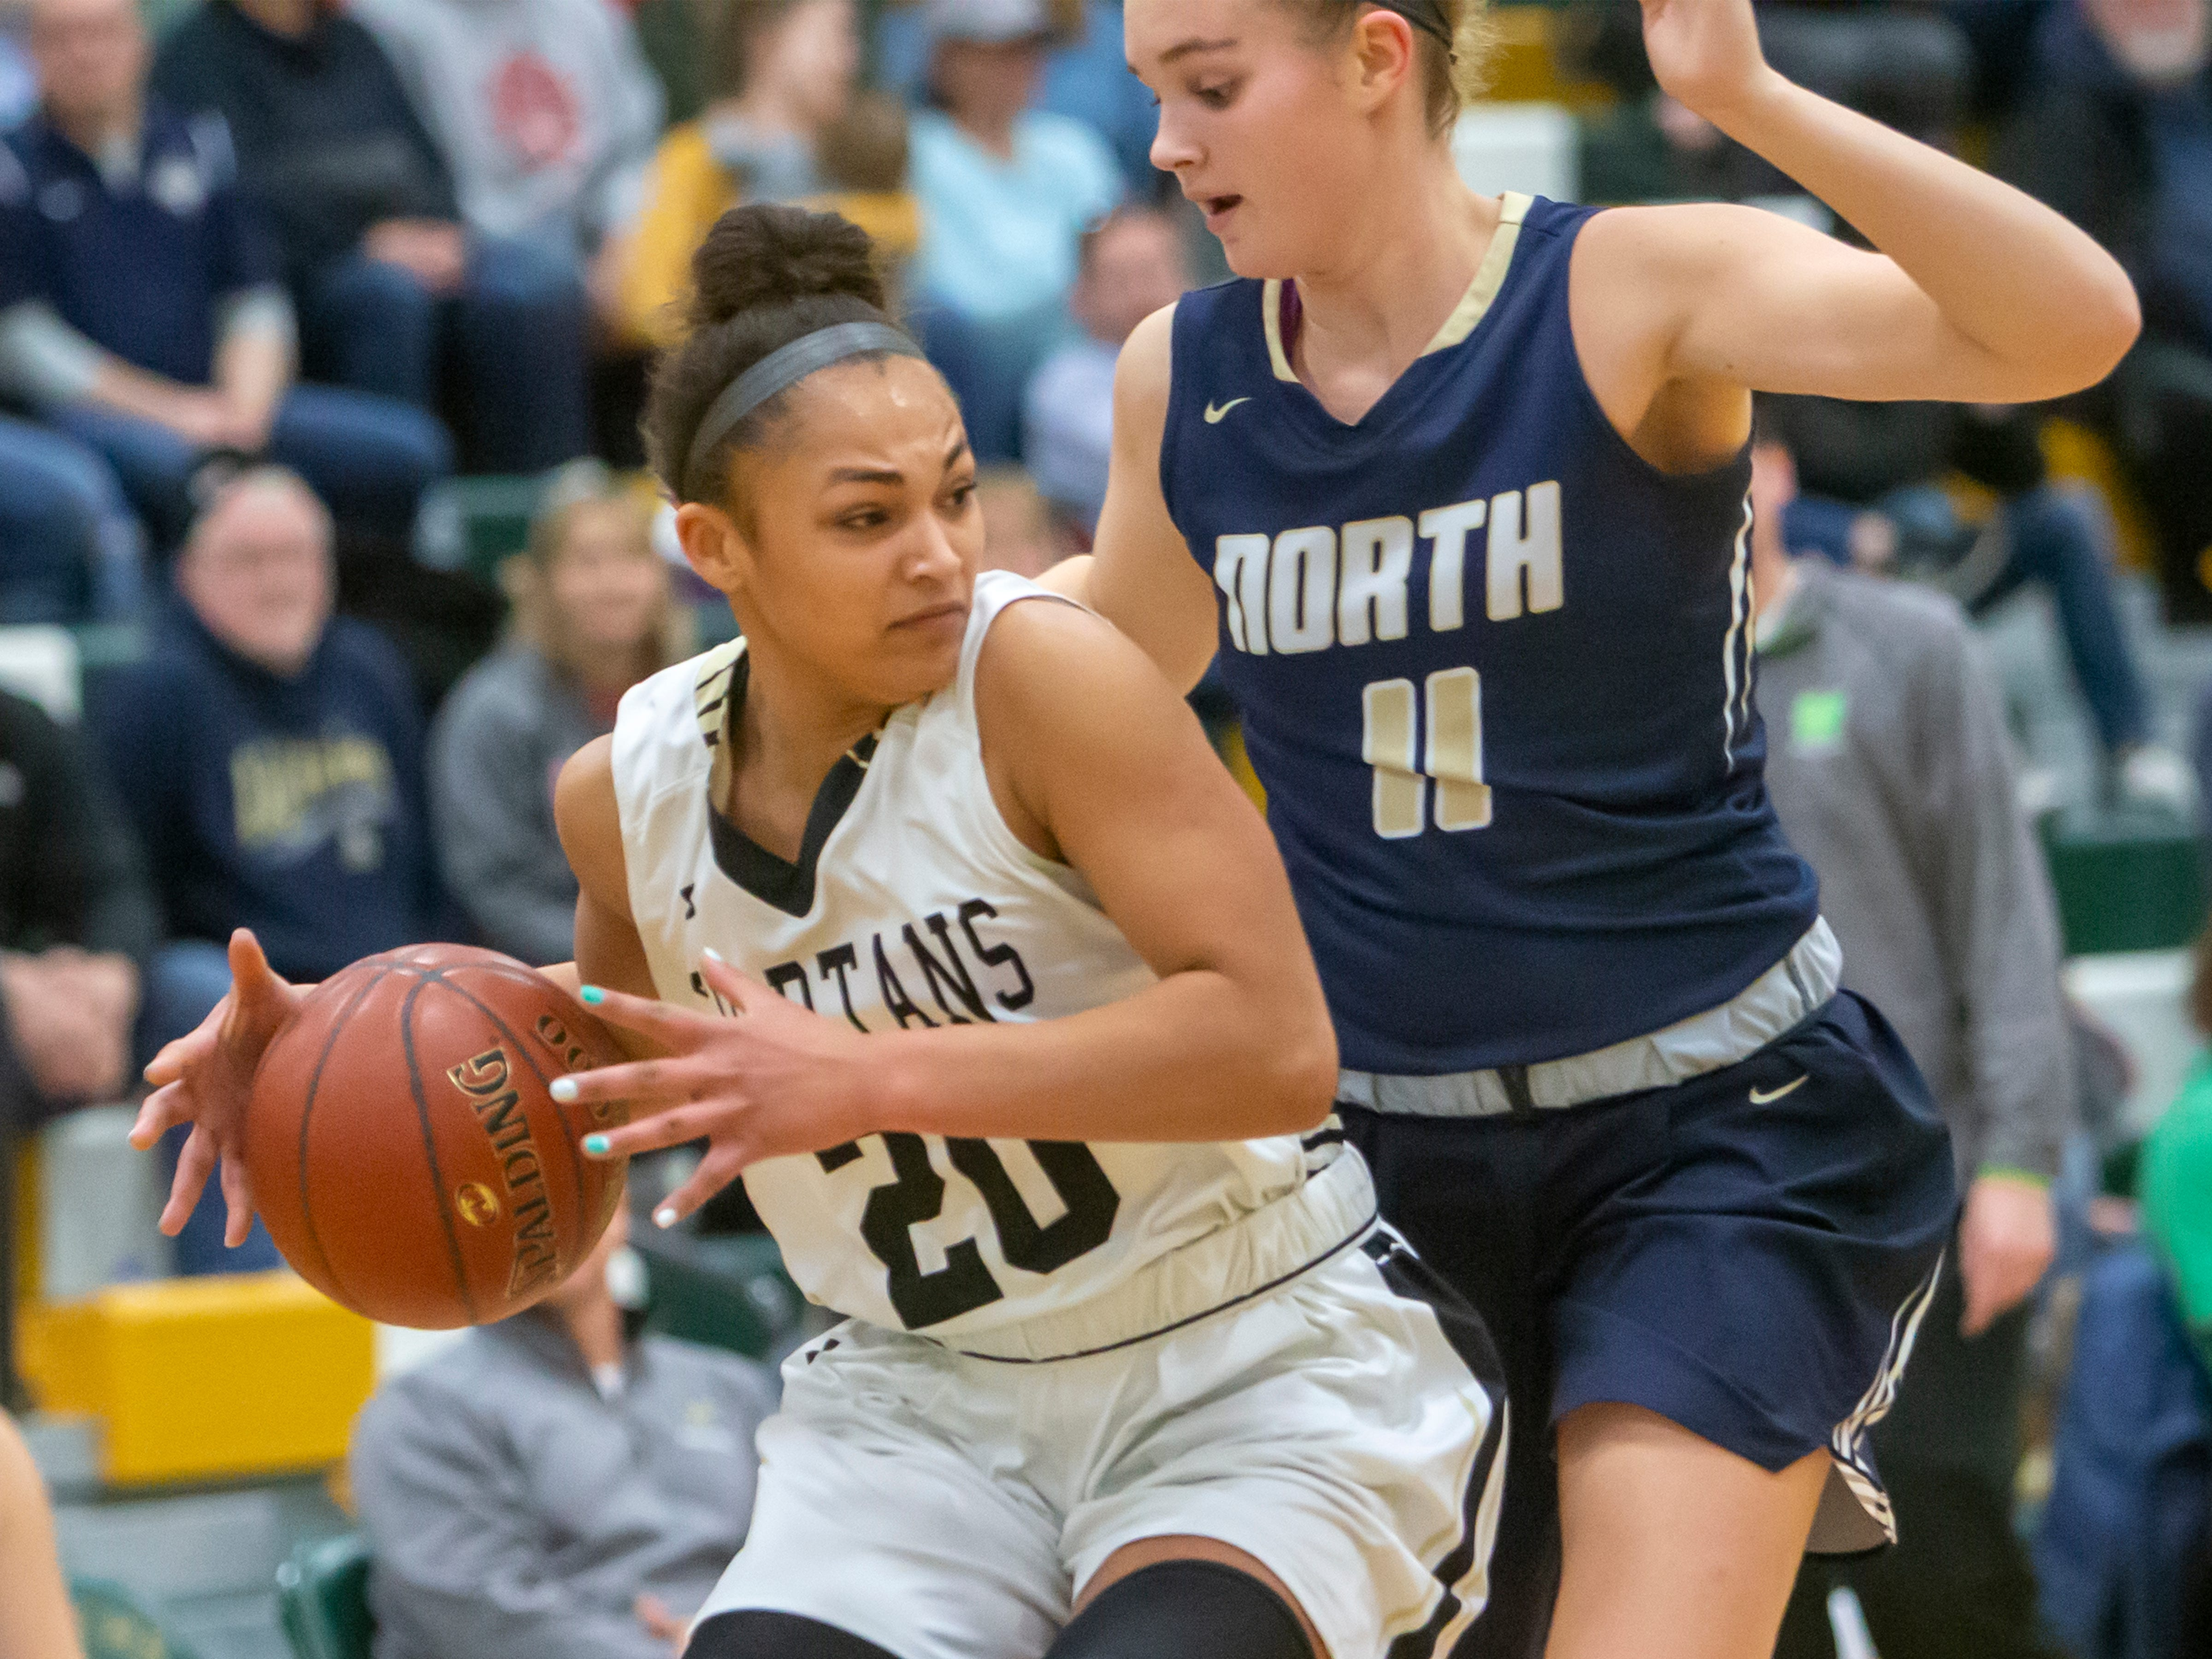 Oshkosh North's Saiga Turner protects control of the ball against Appleton North during the girls basketball game Friday, February 8, 2019, in Oshkosh, Wis., at Oshkosh North High School.